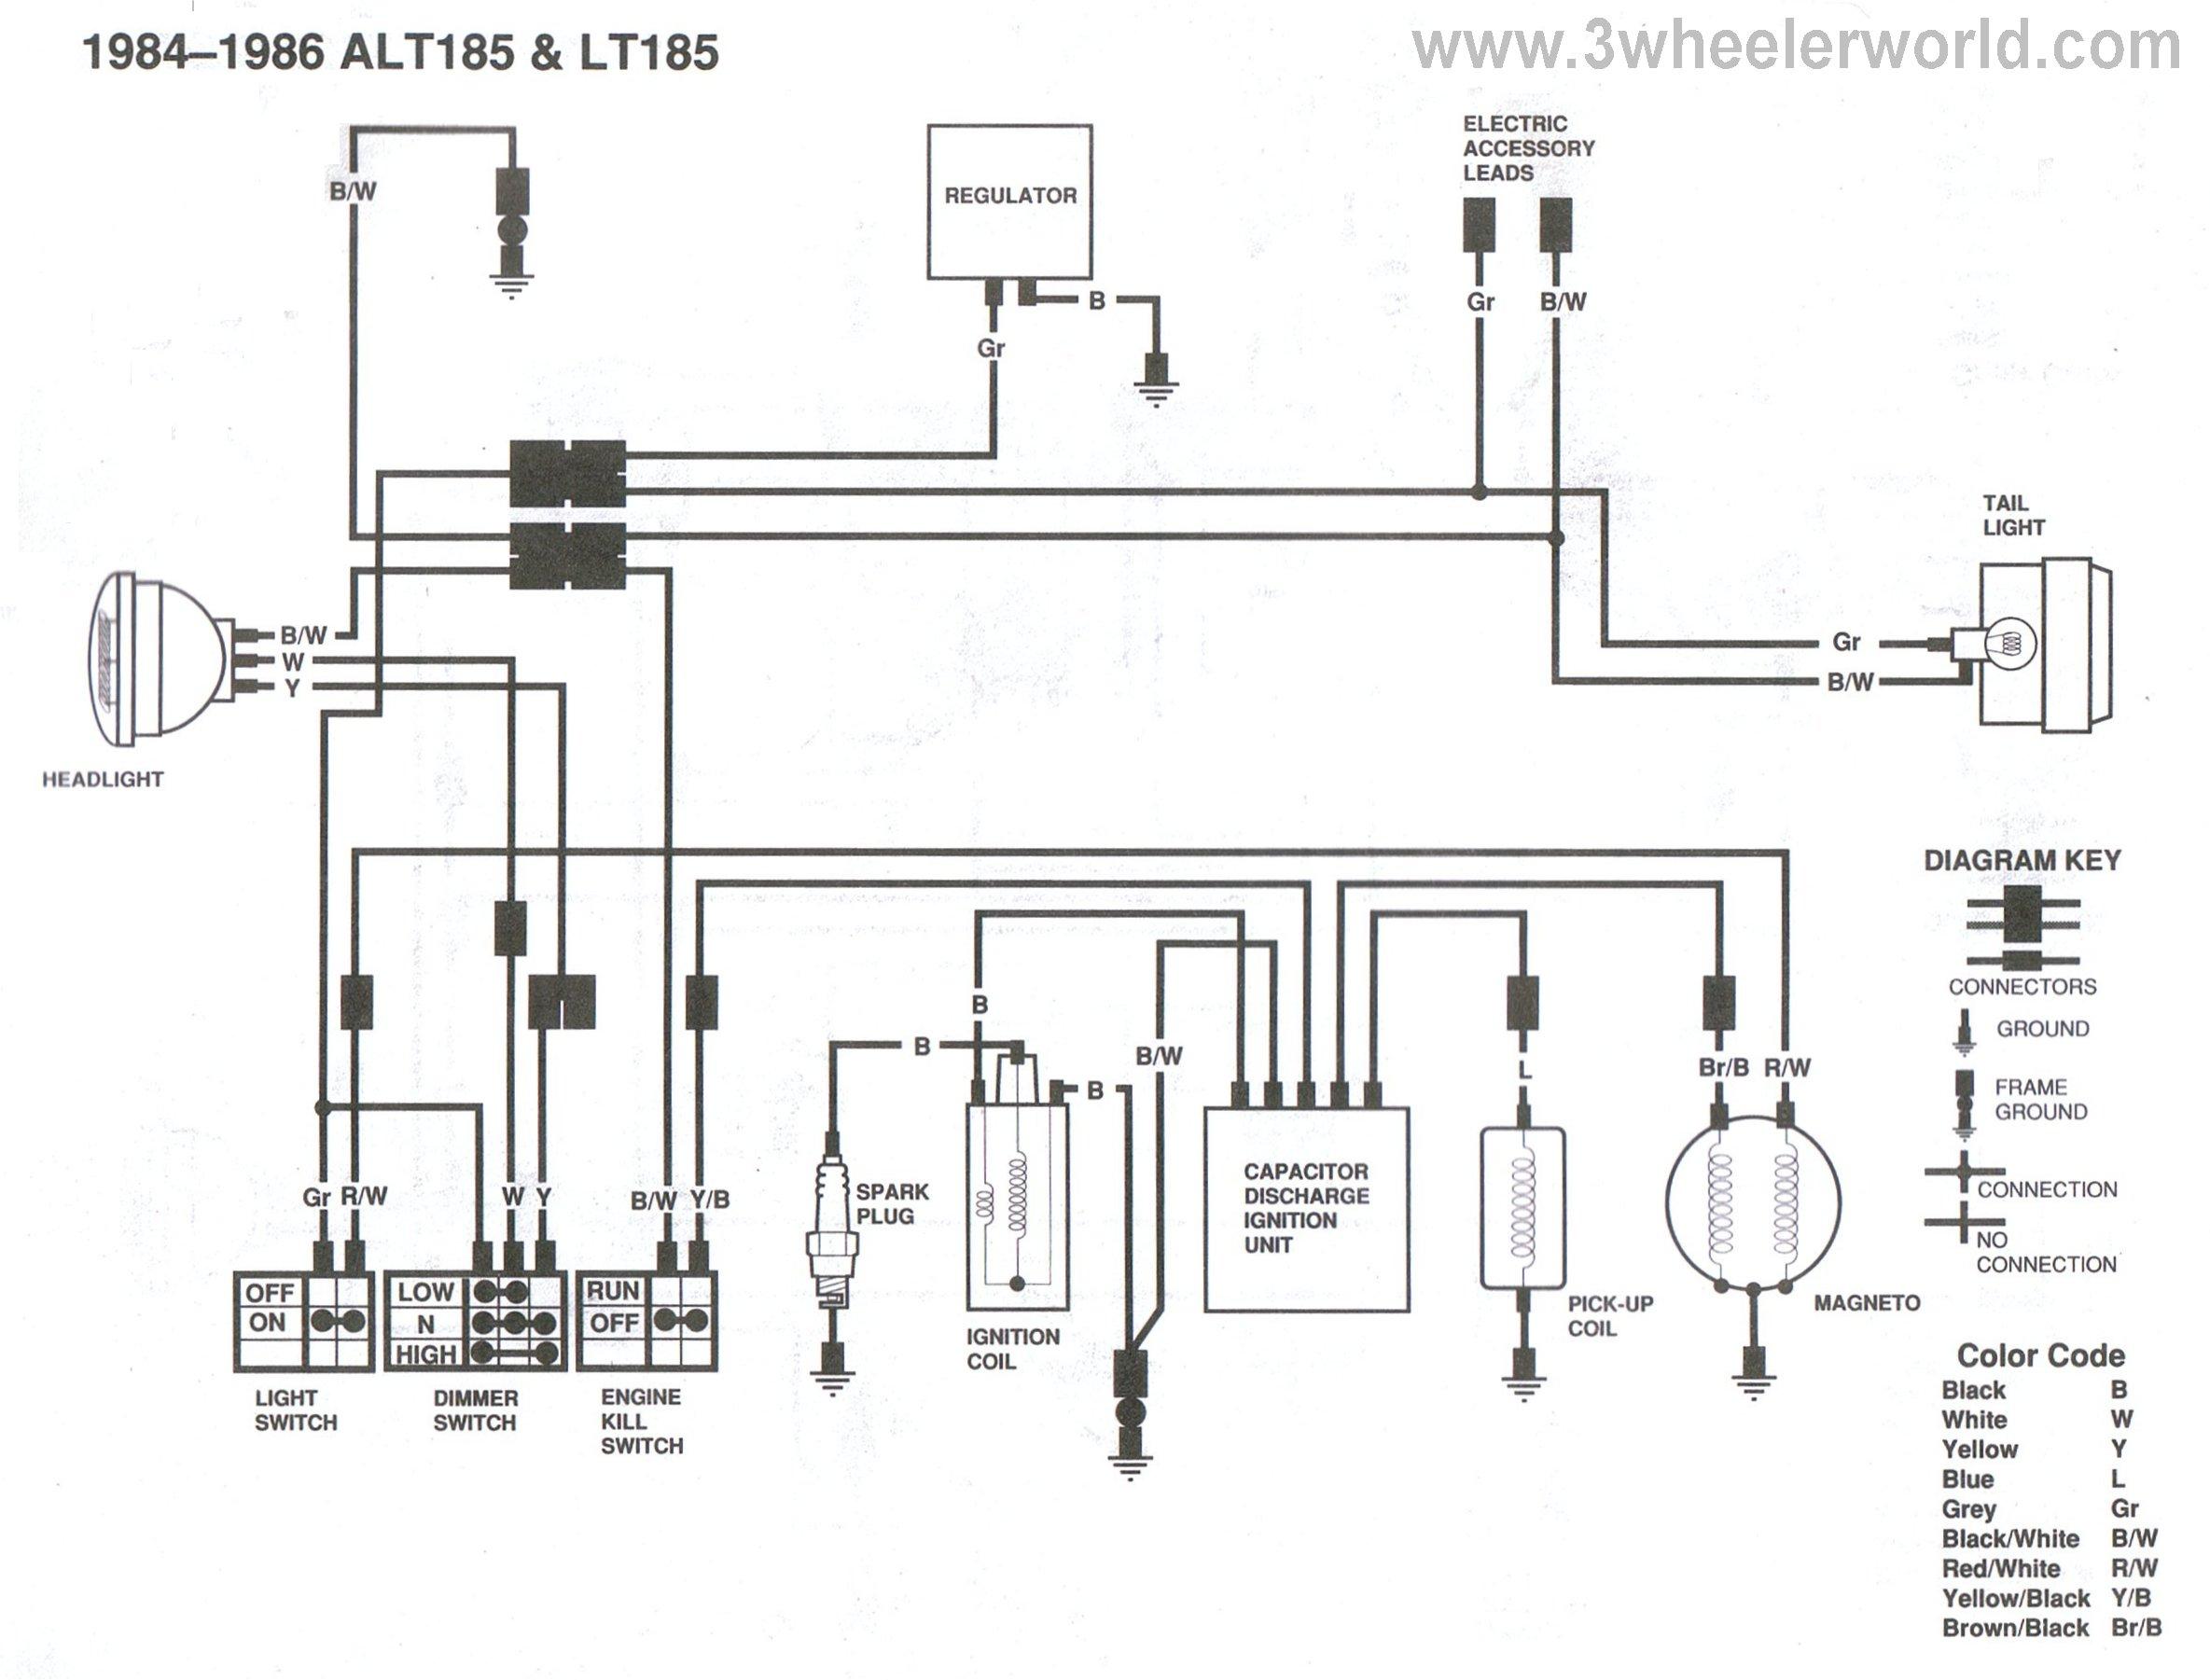 ALT185LT185x84Thru86?resize=665%2C506 1987 honda 125 fourtrax wiring diagram wiring diagram,1986 Honda Trx 125 Wiring Diagram